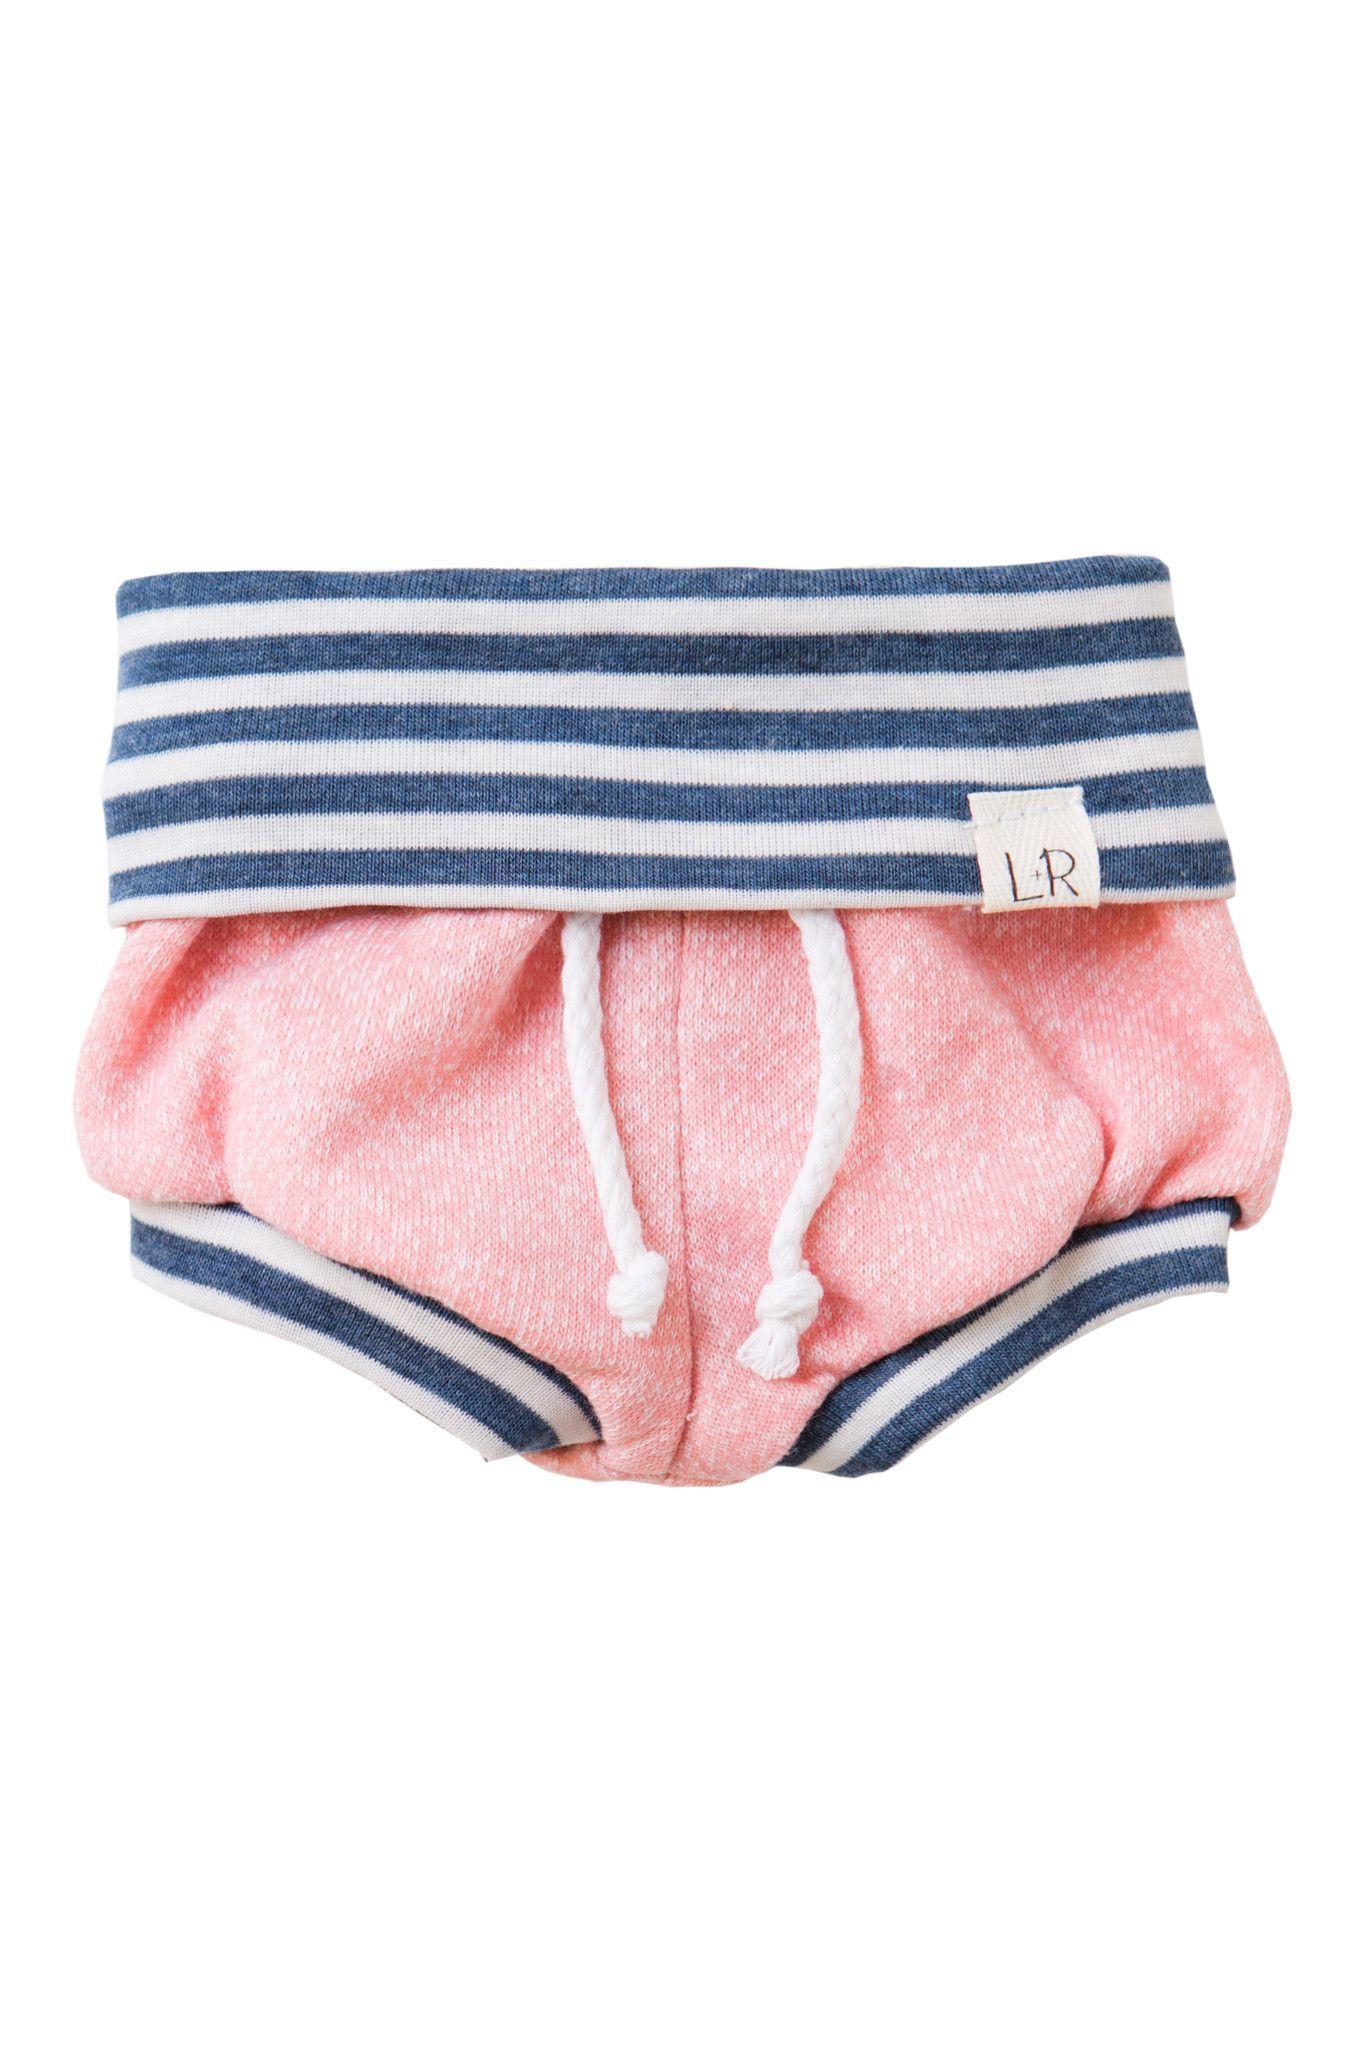 Lulu + Roo   Shorties in Blush and Navy Stripe